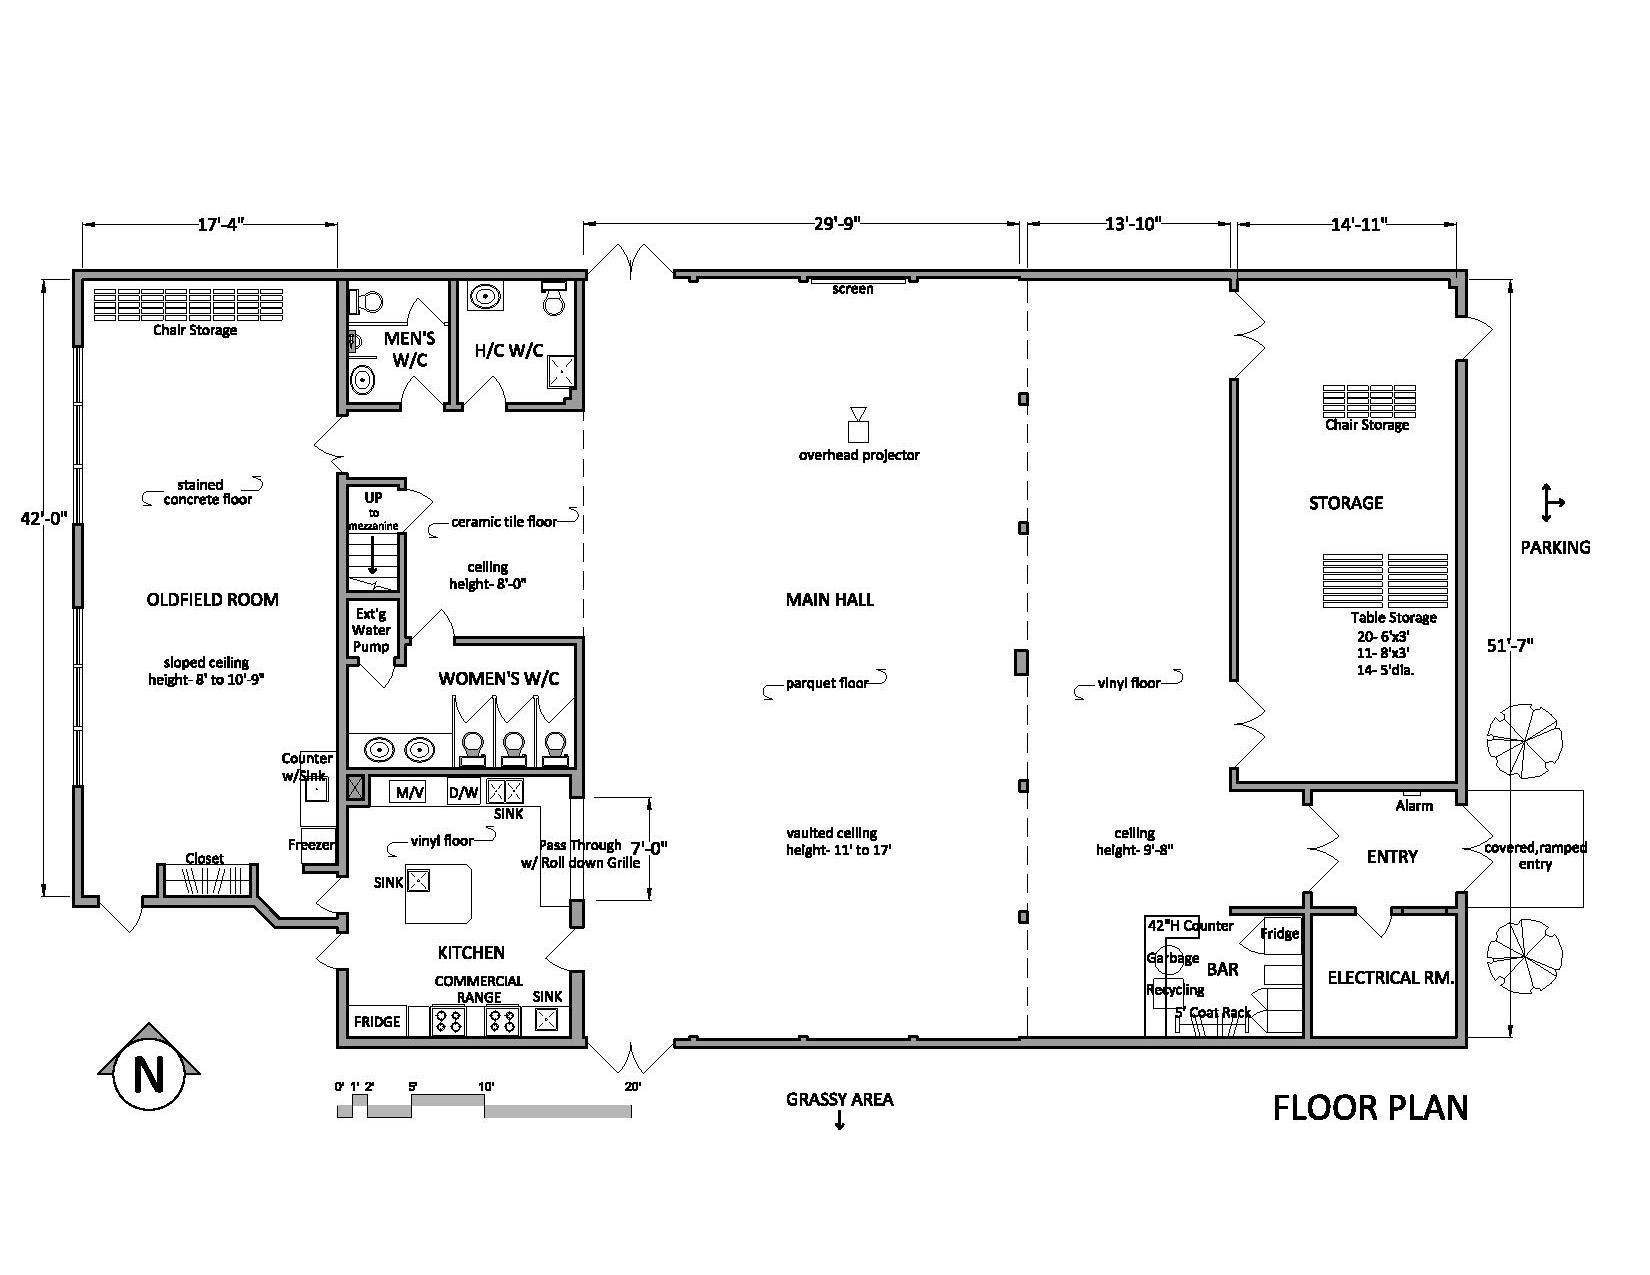 Prospect lake hall floor plan page 1650 1275 for Wedding floor plan designer